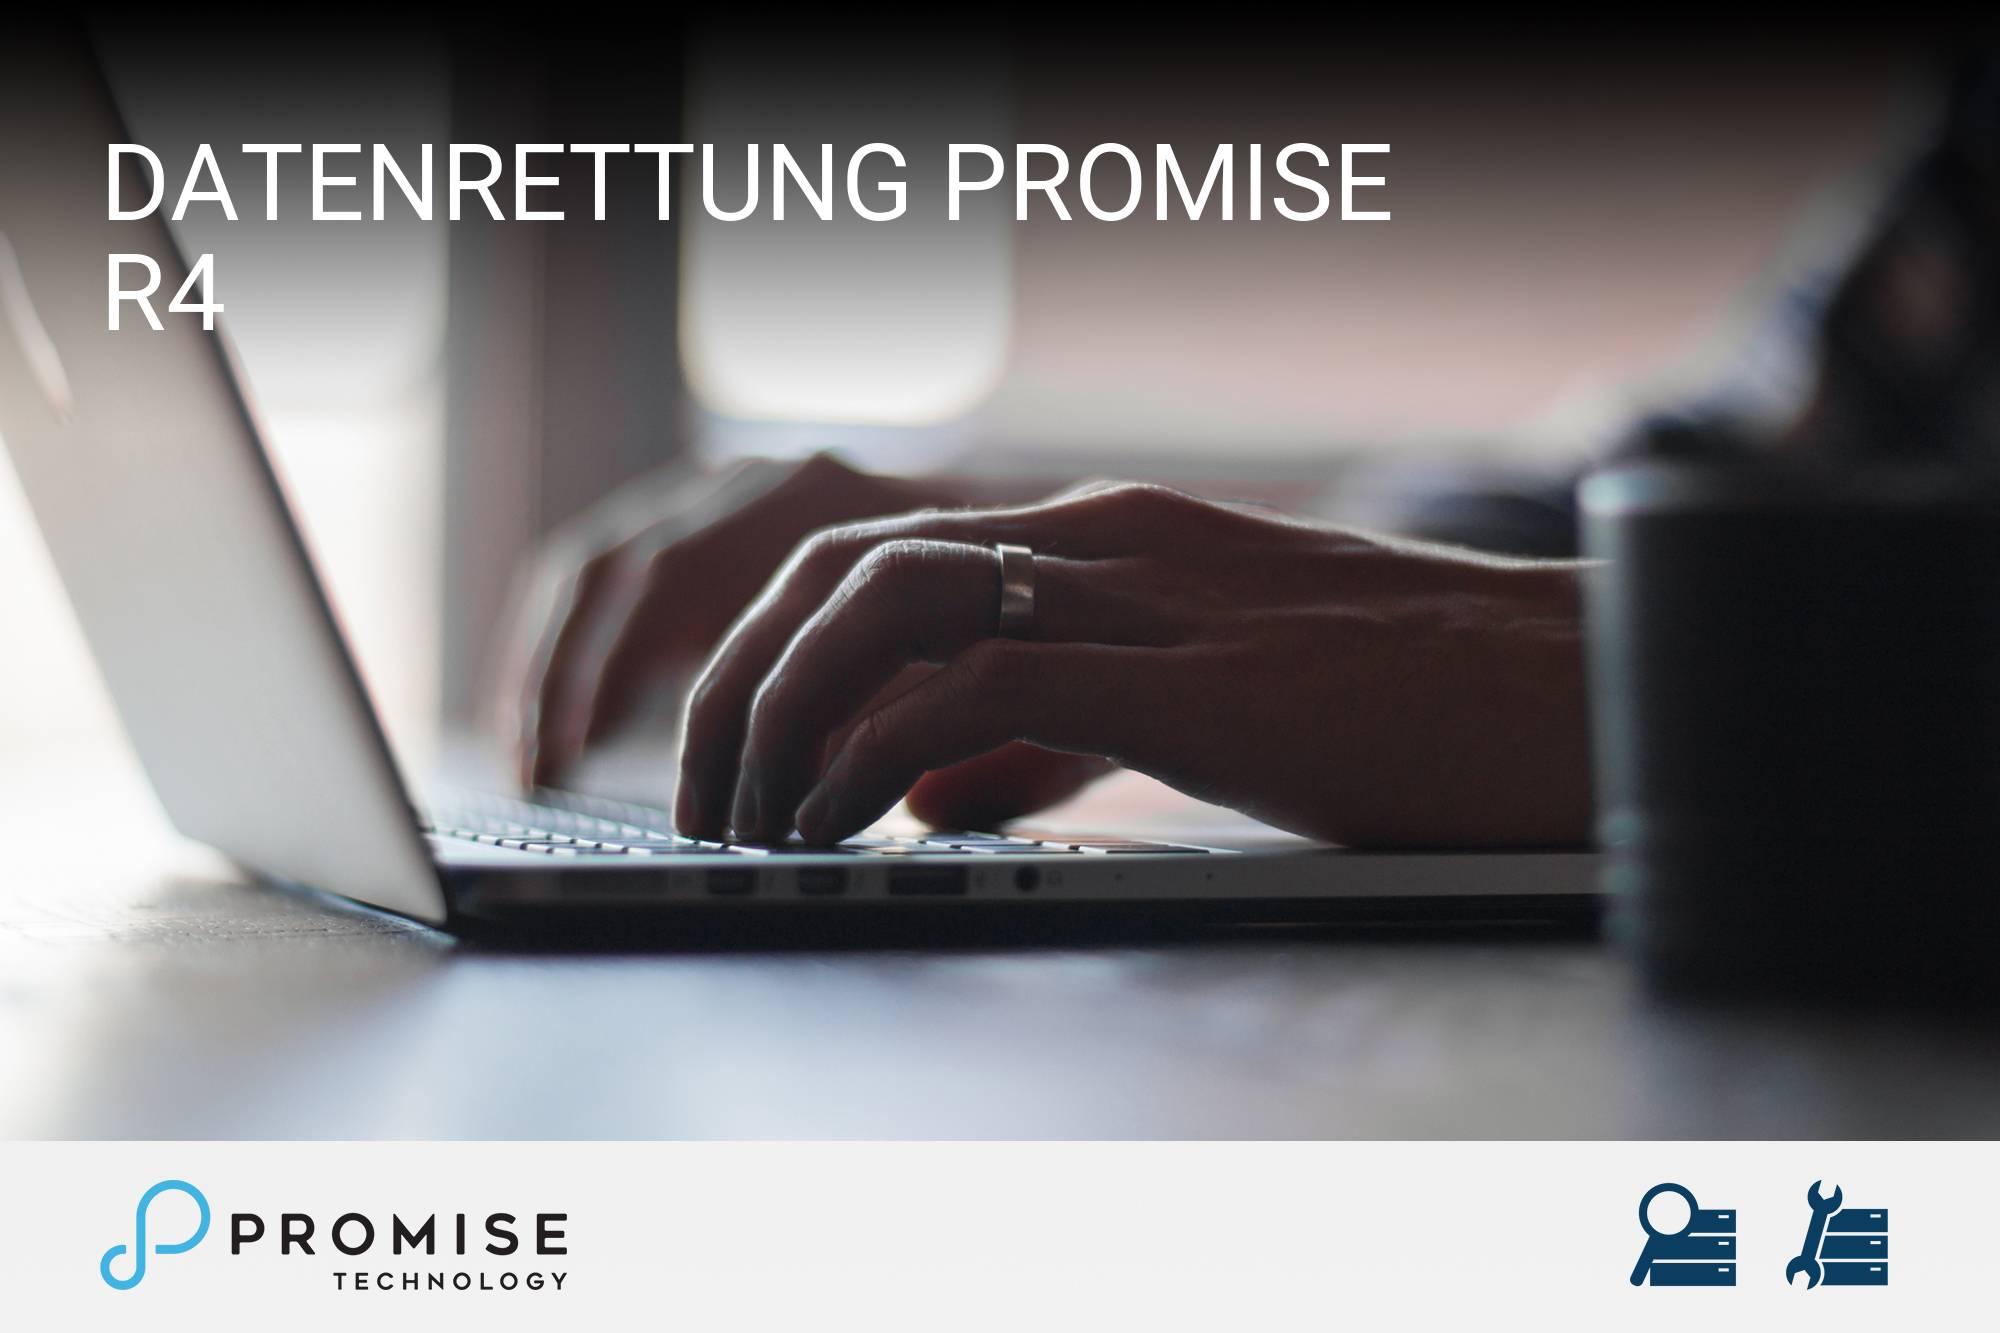 Promise R4